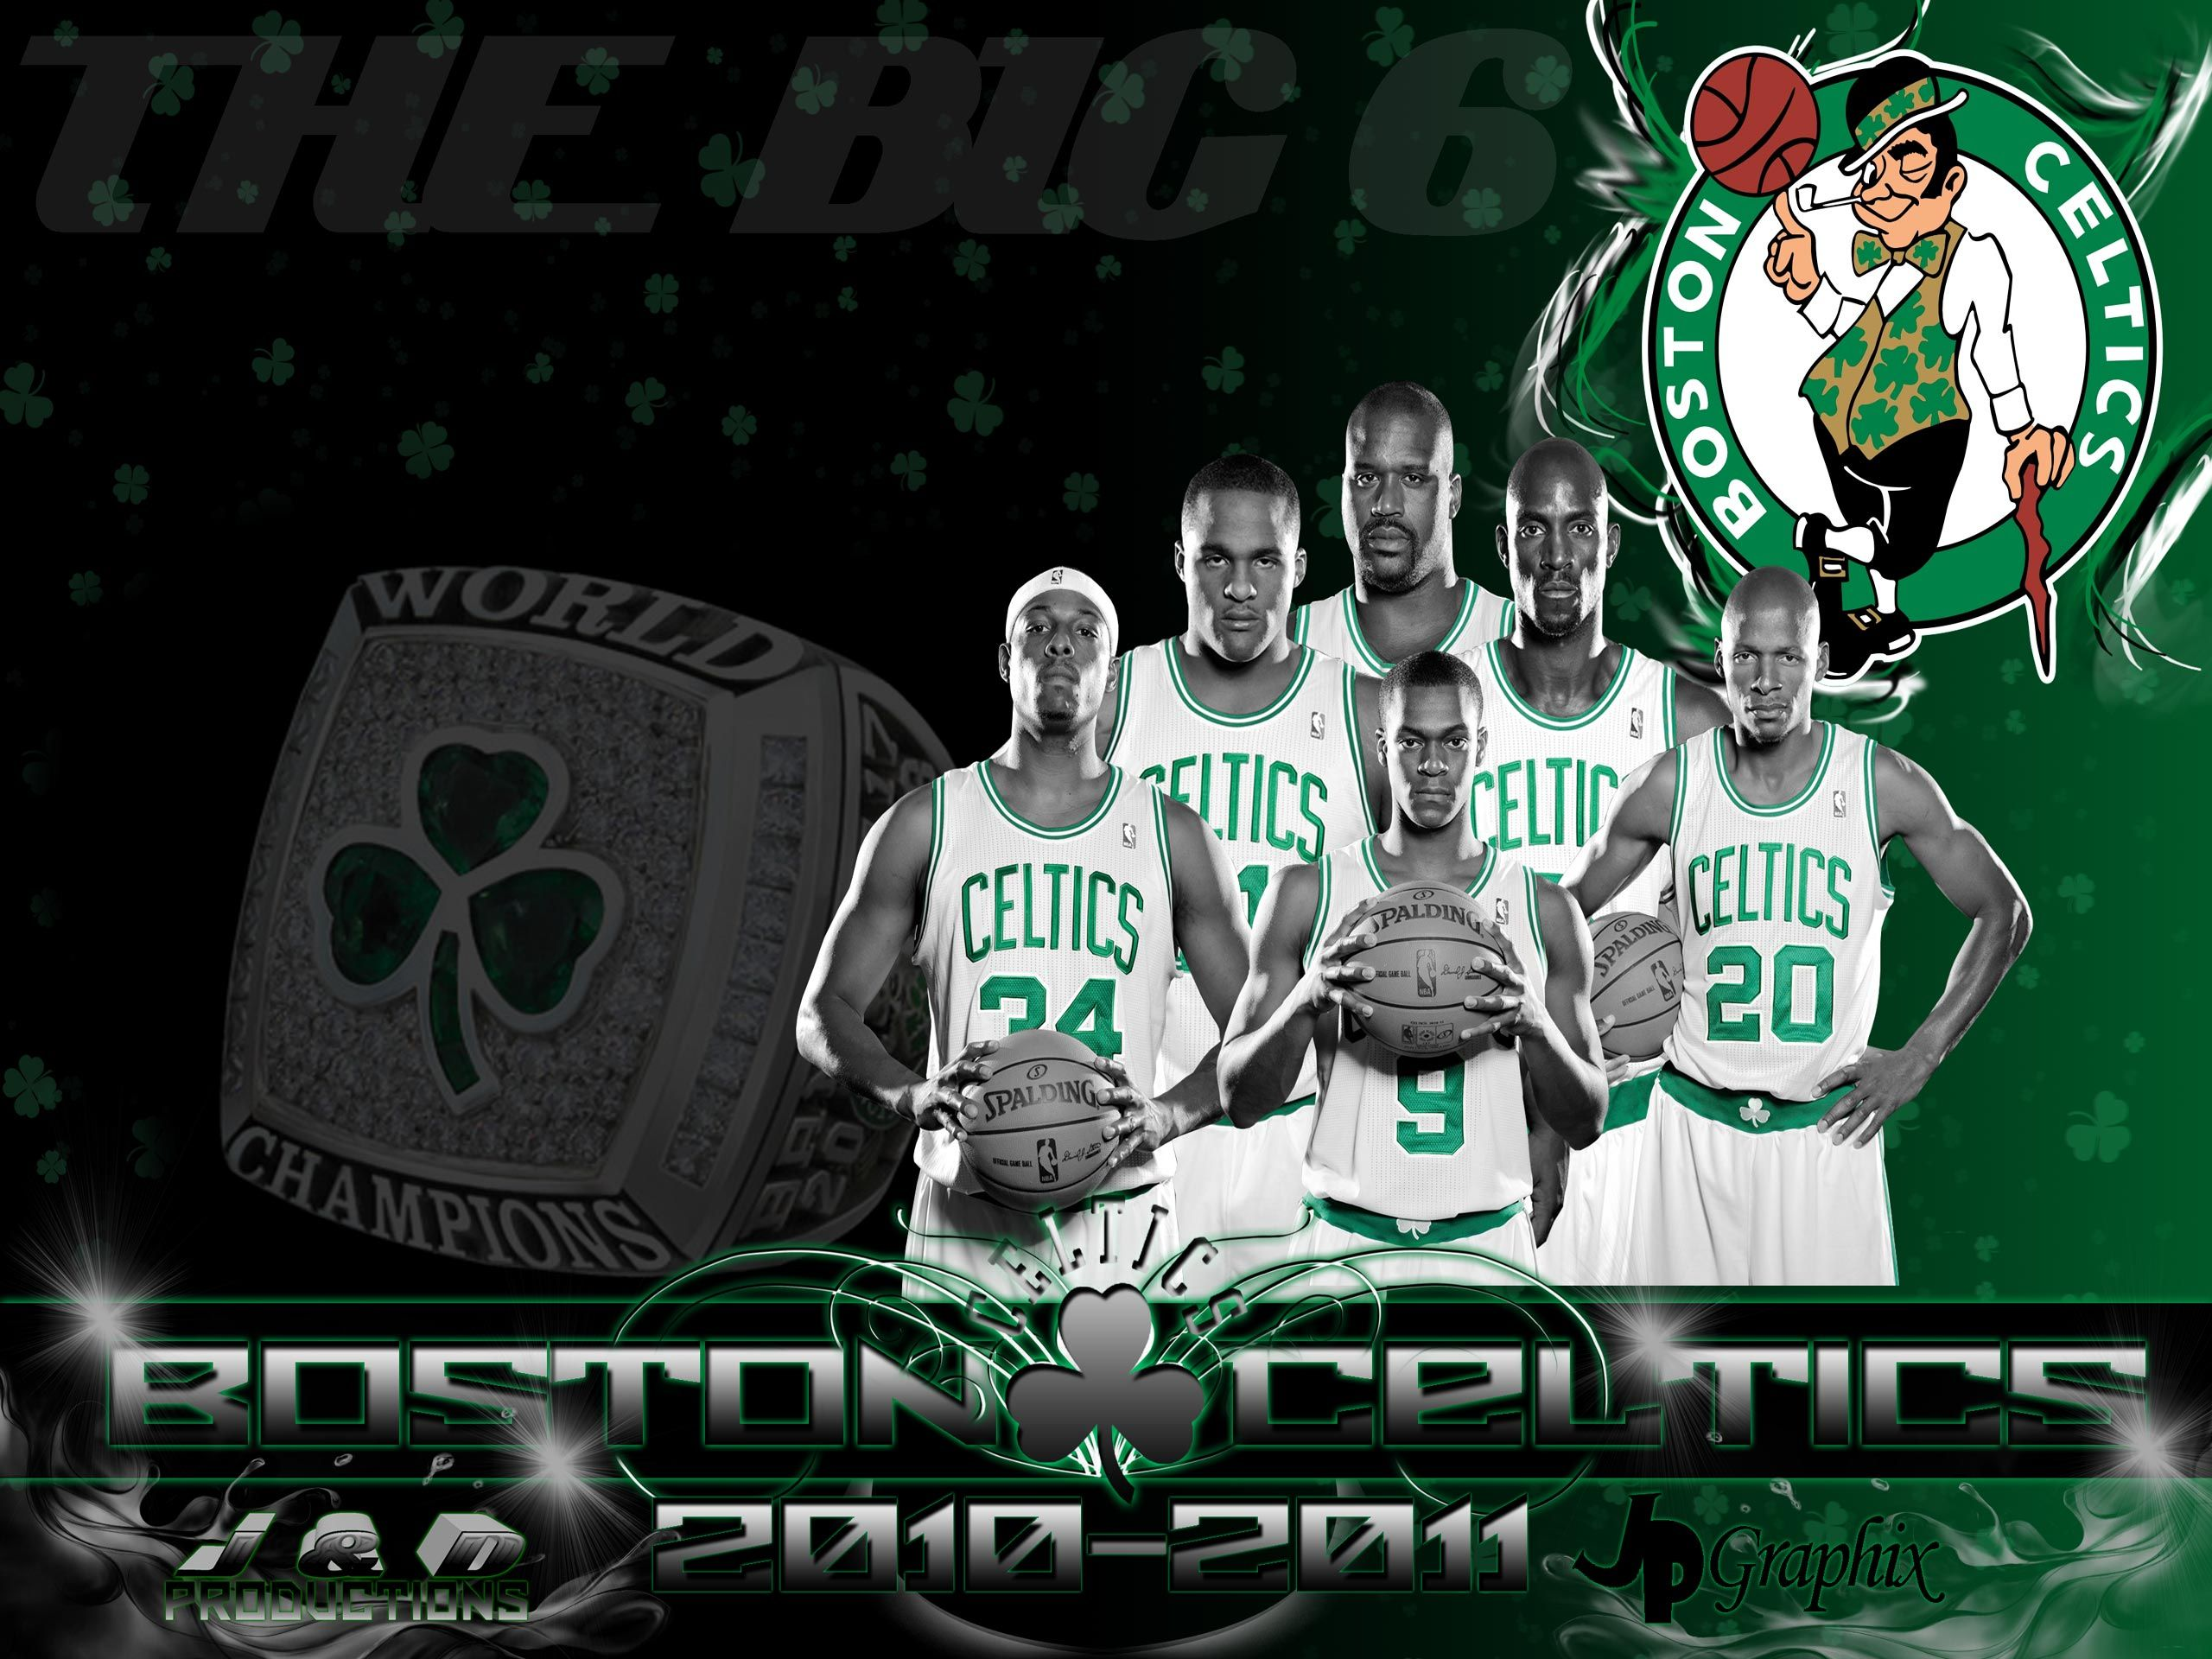 Boston Celtics IphoneWallpaper http//www.nbawallpaper